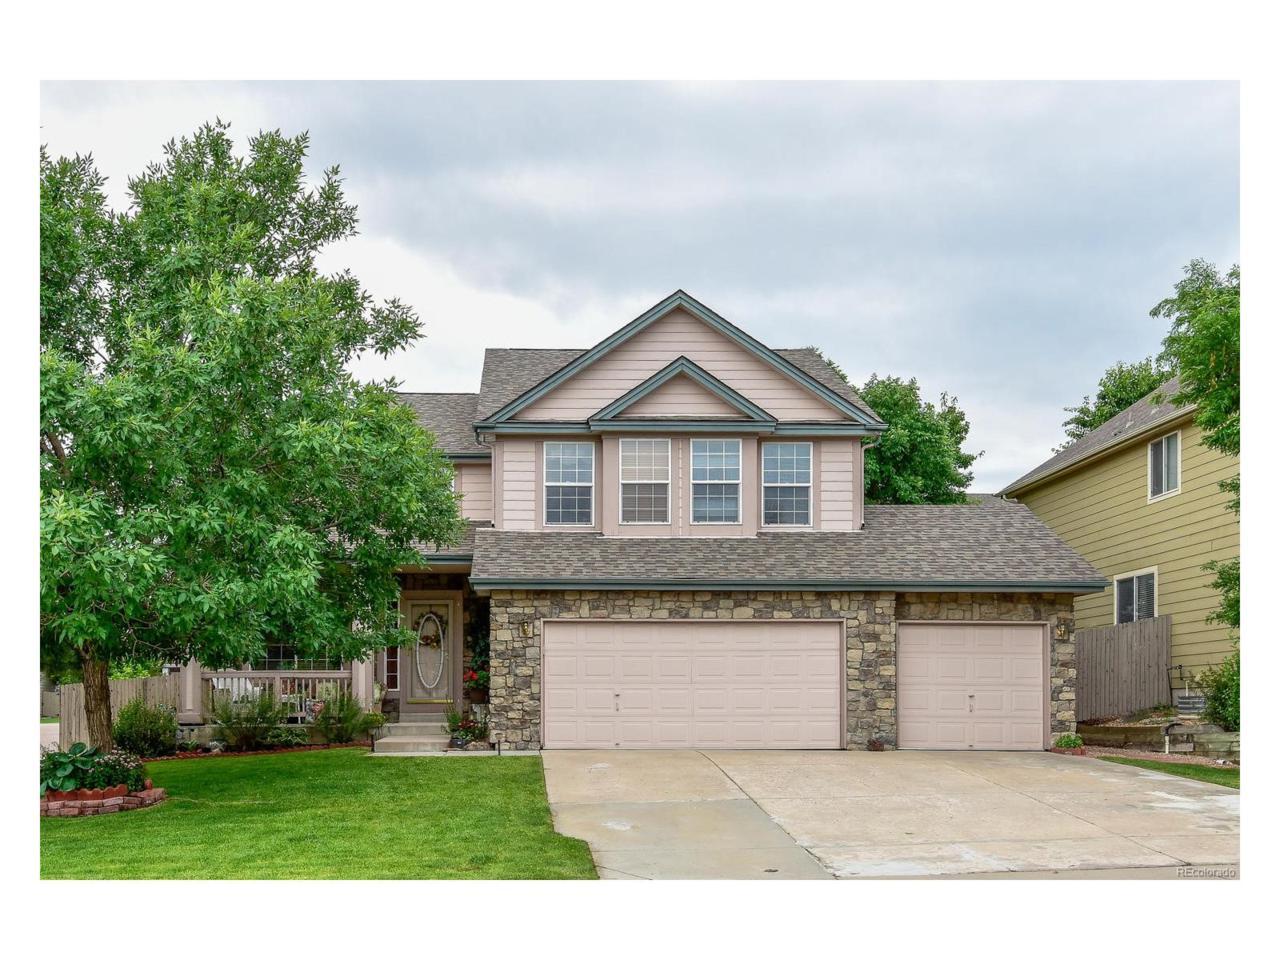 11702 W Belmont Place, Littleton, CO 80127 (MLS #5859195) :: 8z Real Estate